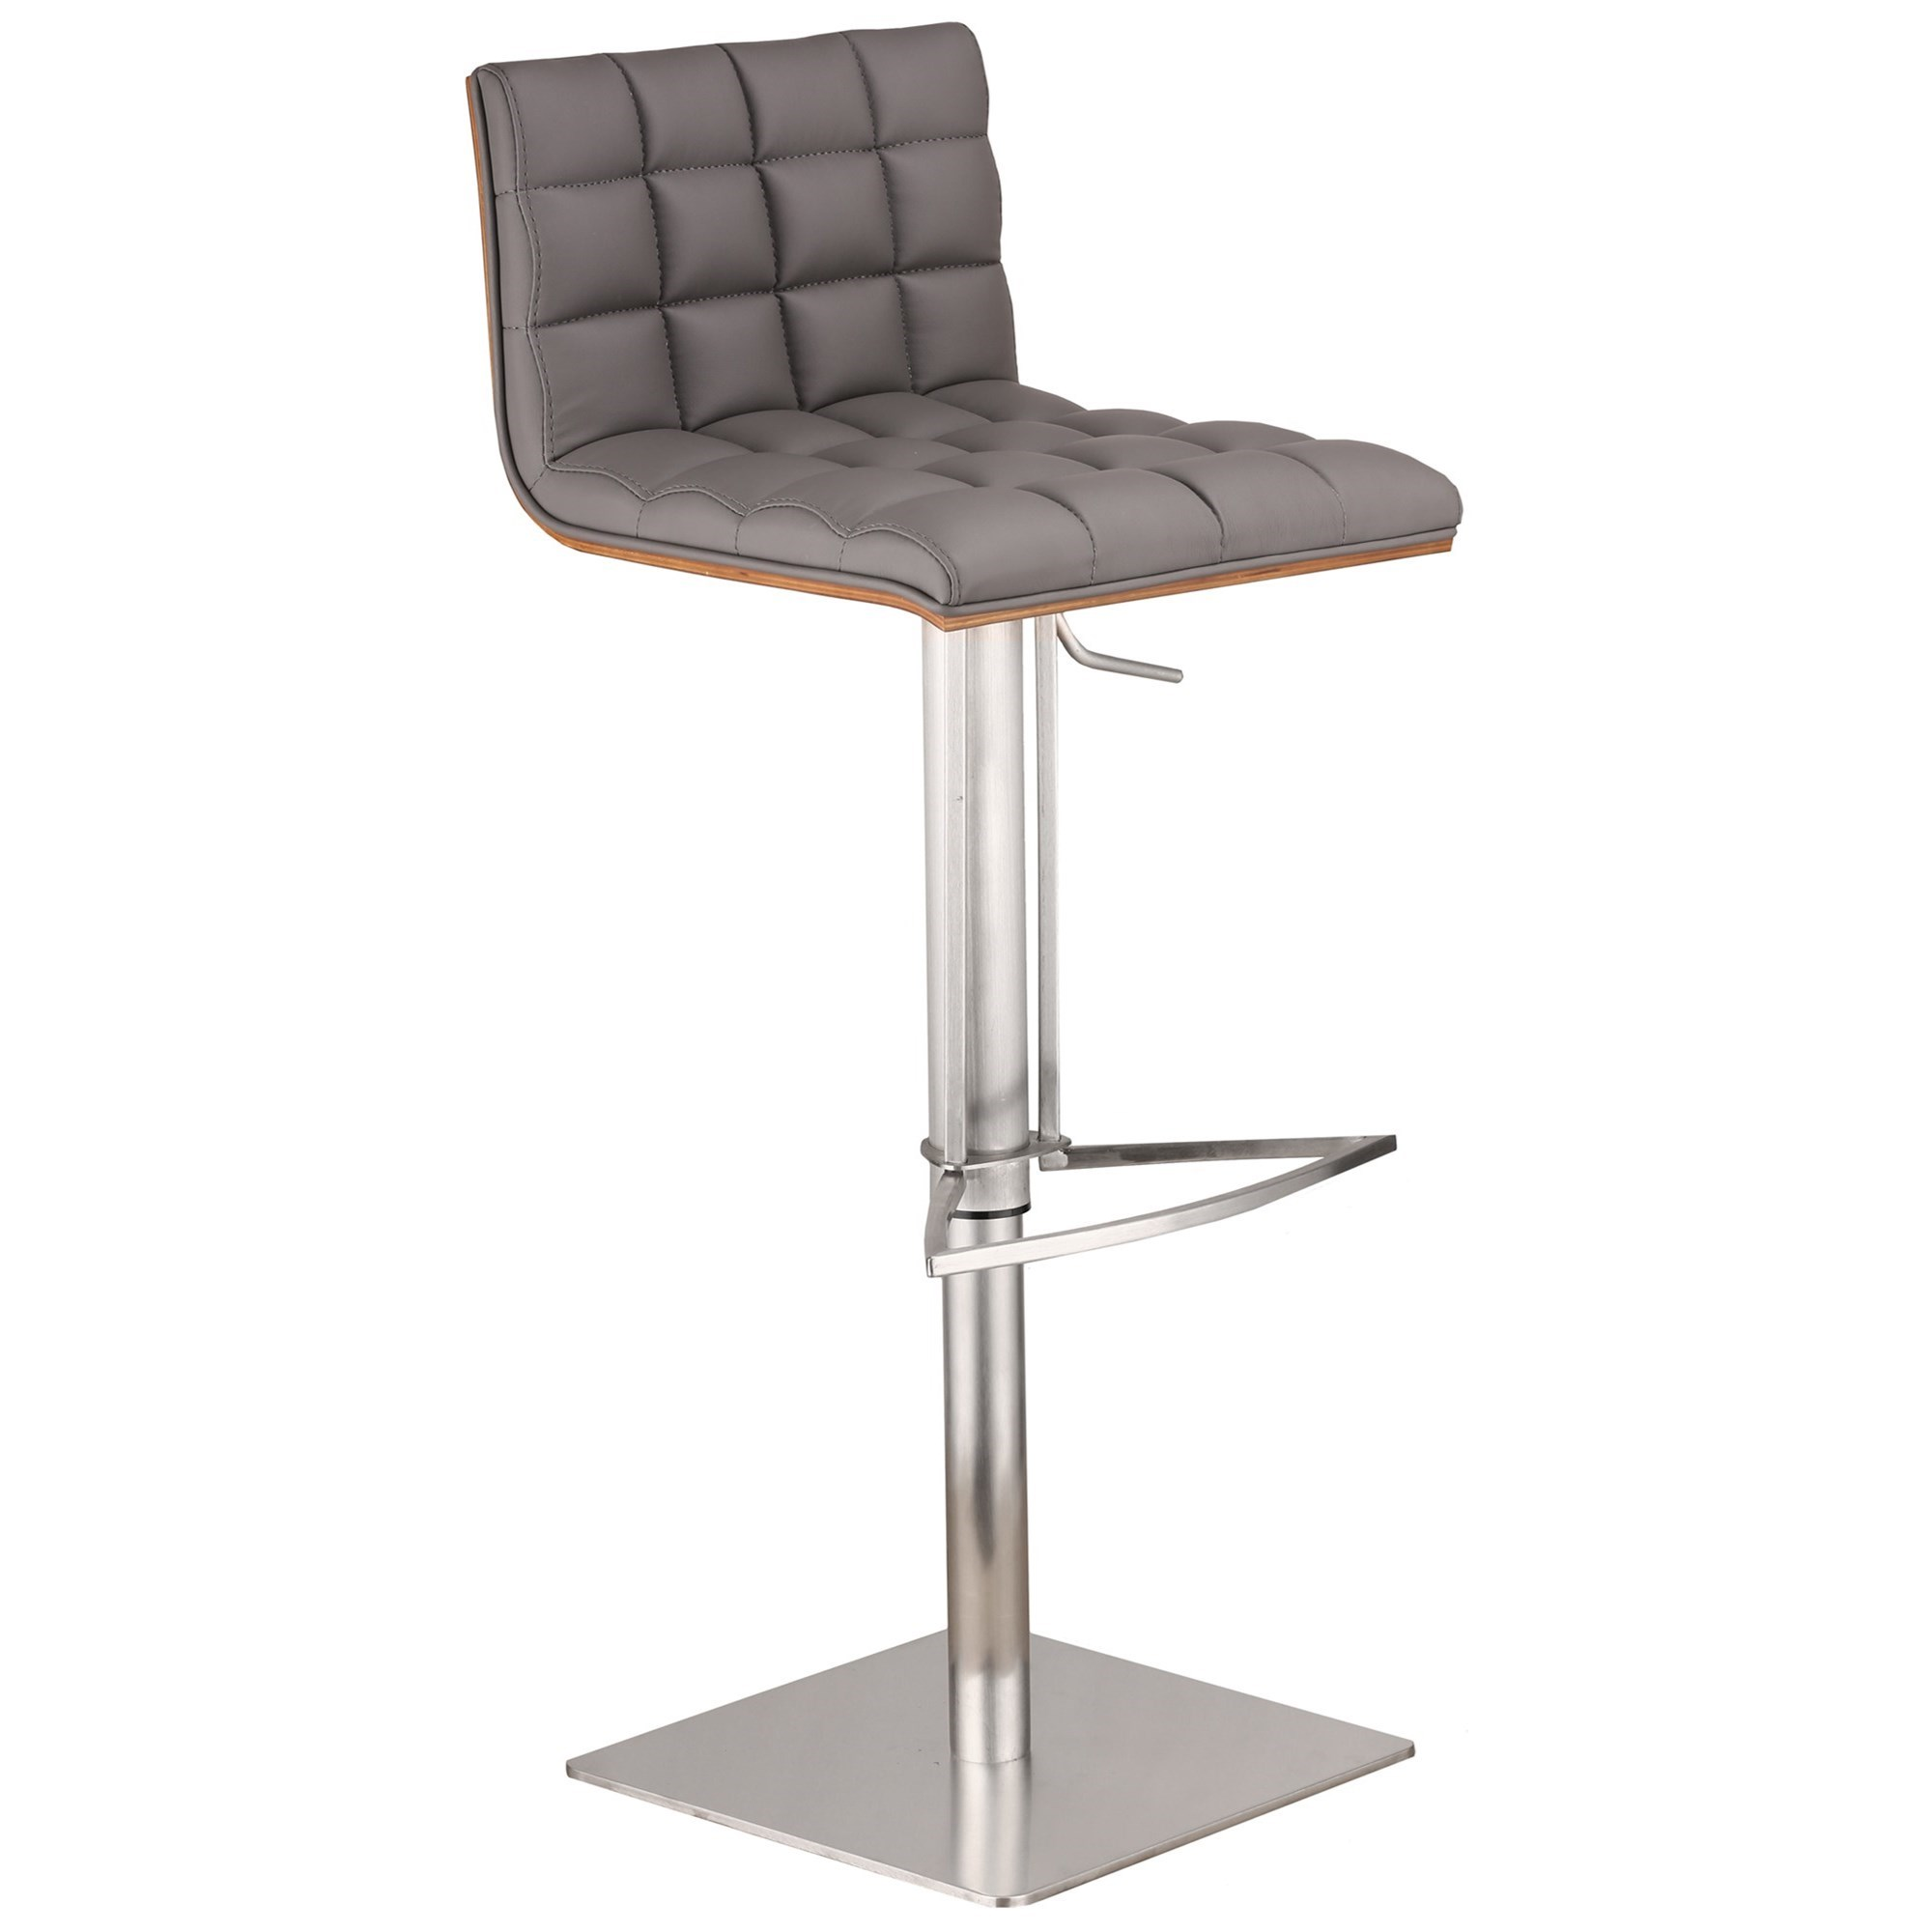 Oslo Adjustable Bar Stool by Armen Living at Michael Alan Furniture & Design